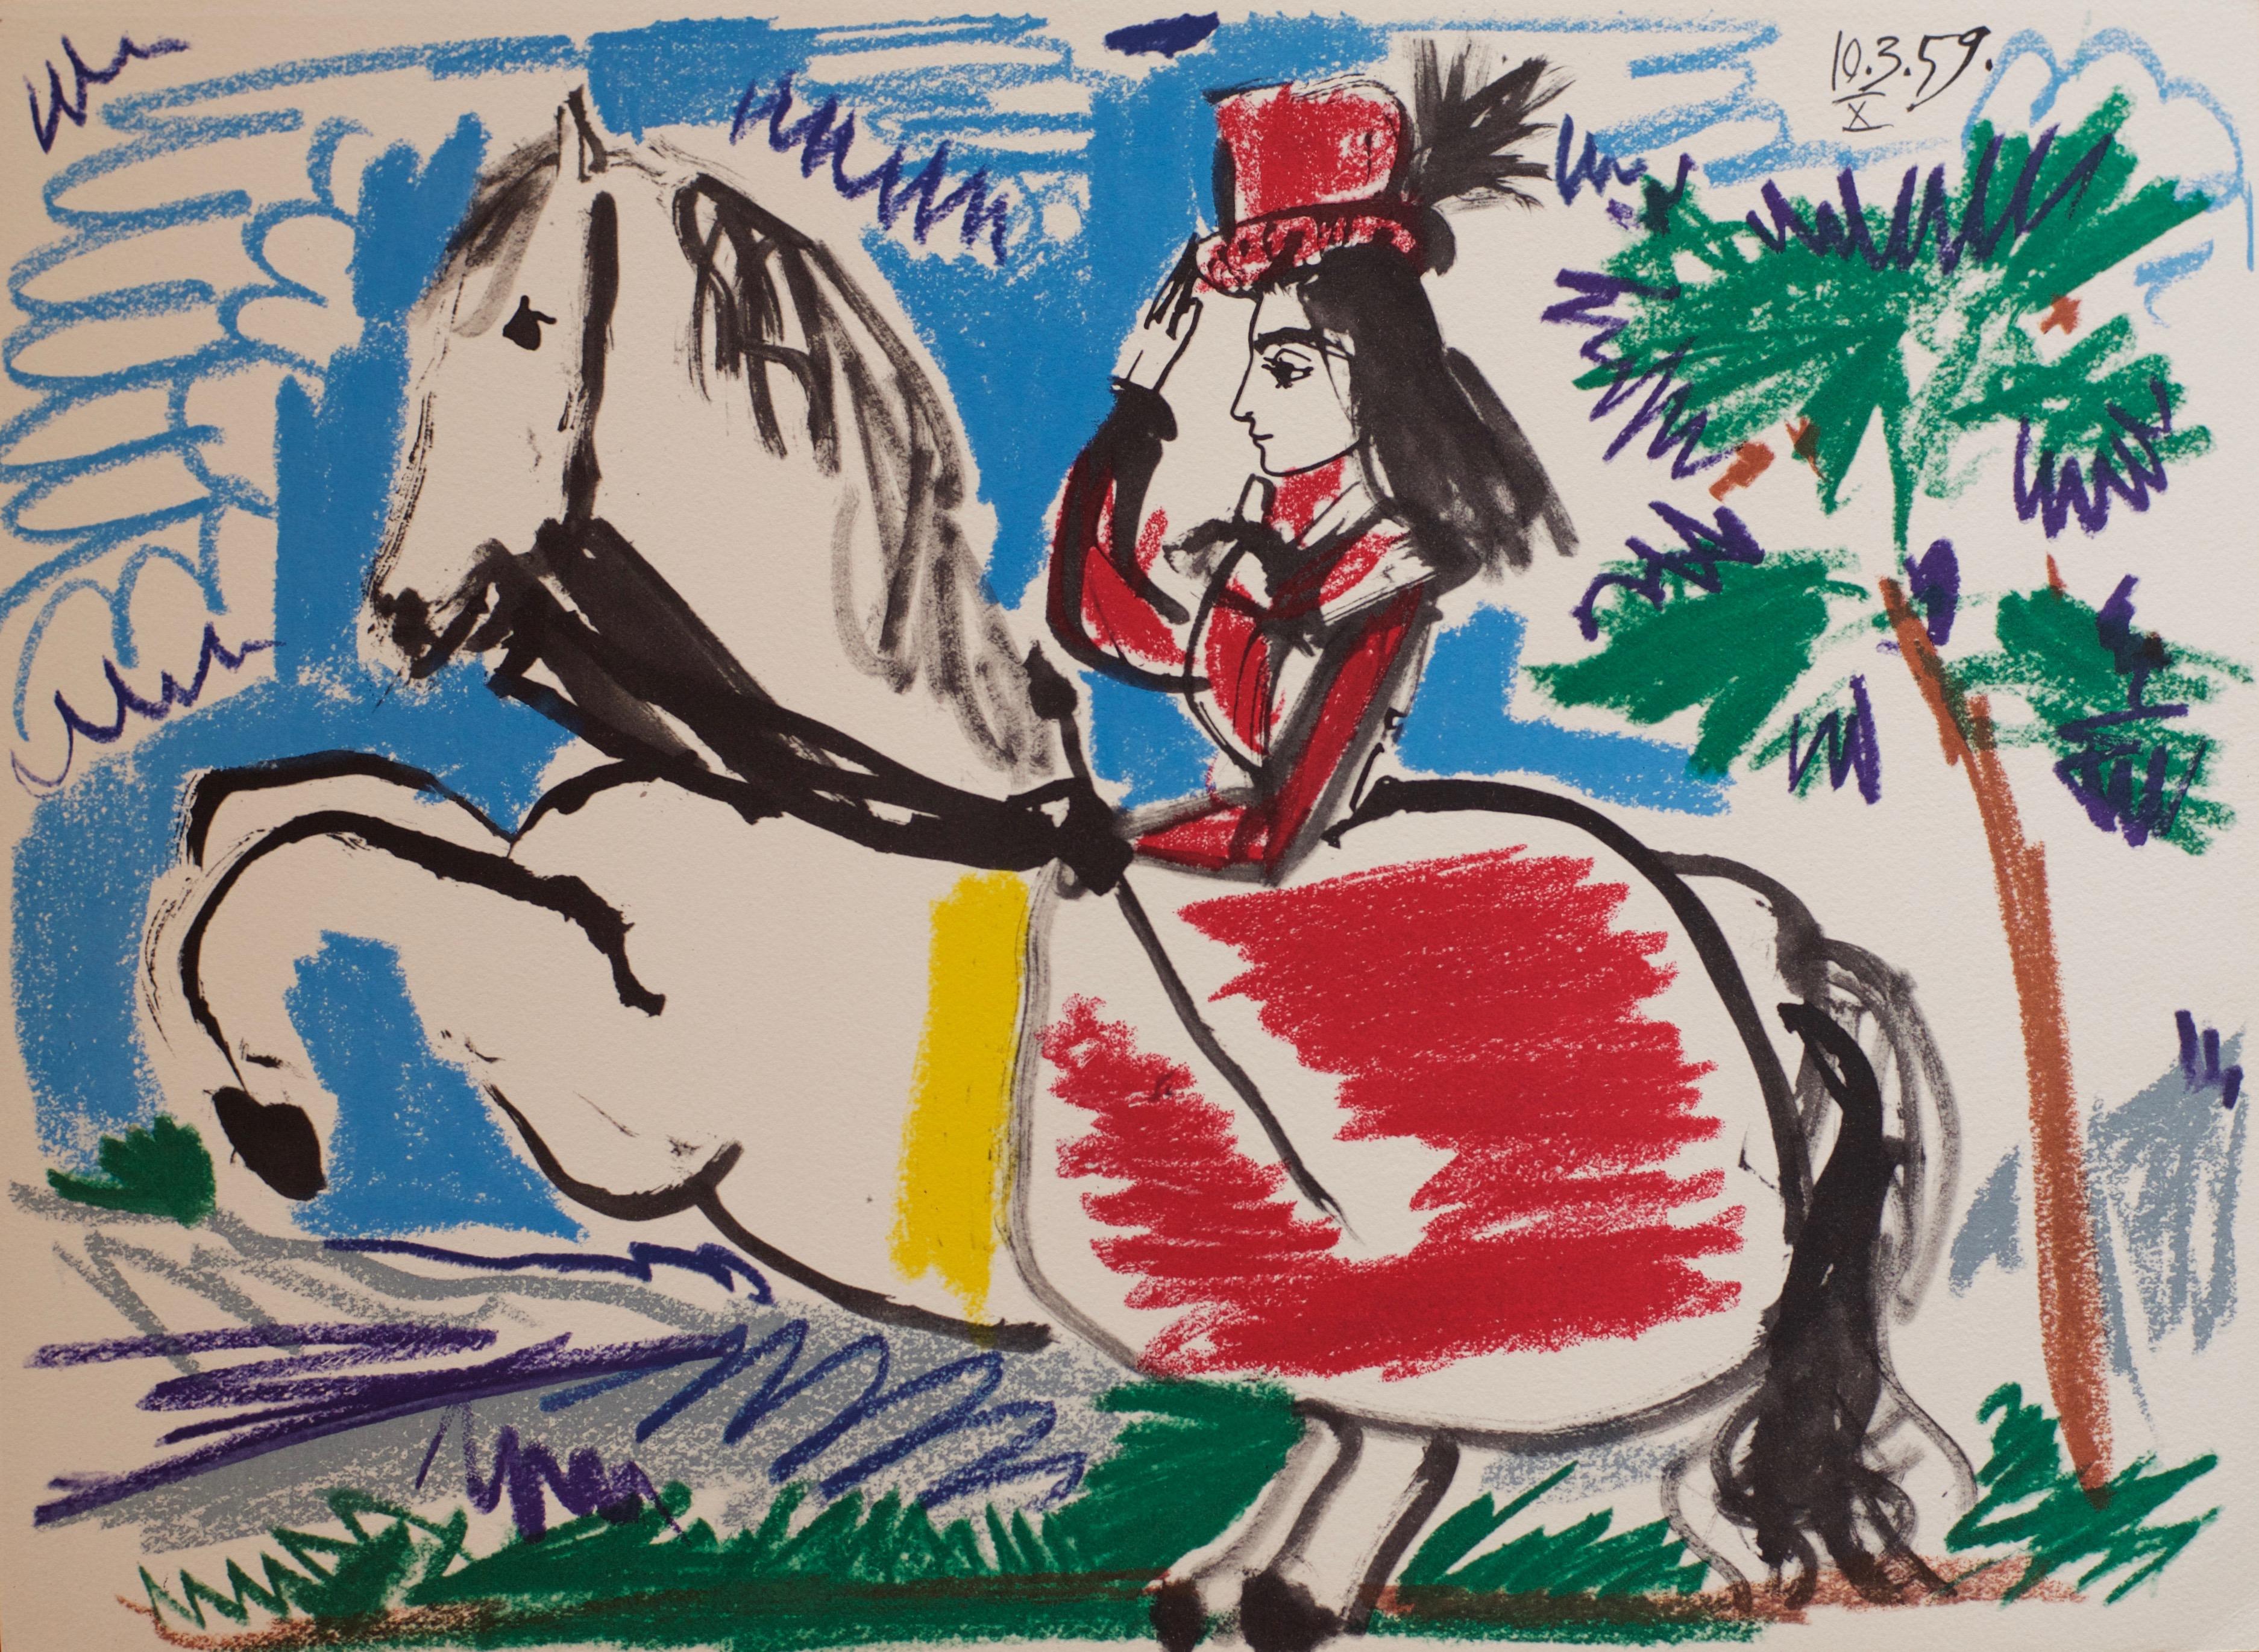 6_Pablo Picasso_Da TOROS Y TOREROS_Amazone X 10-03-1959